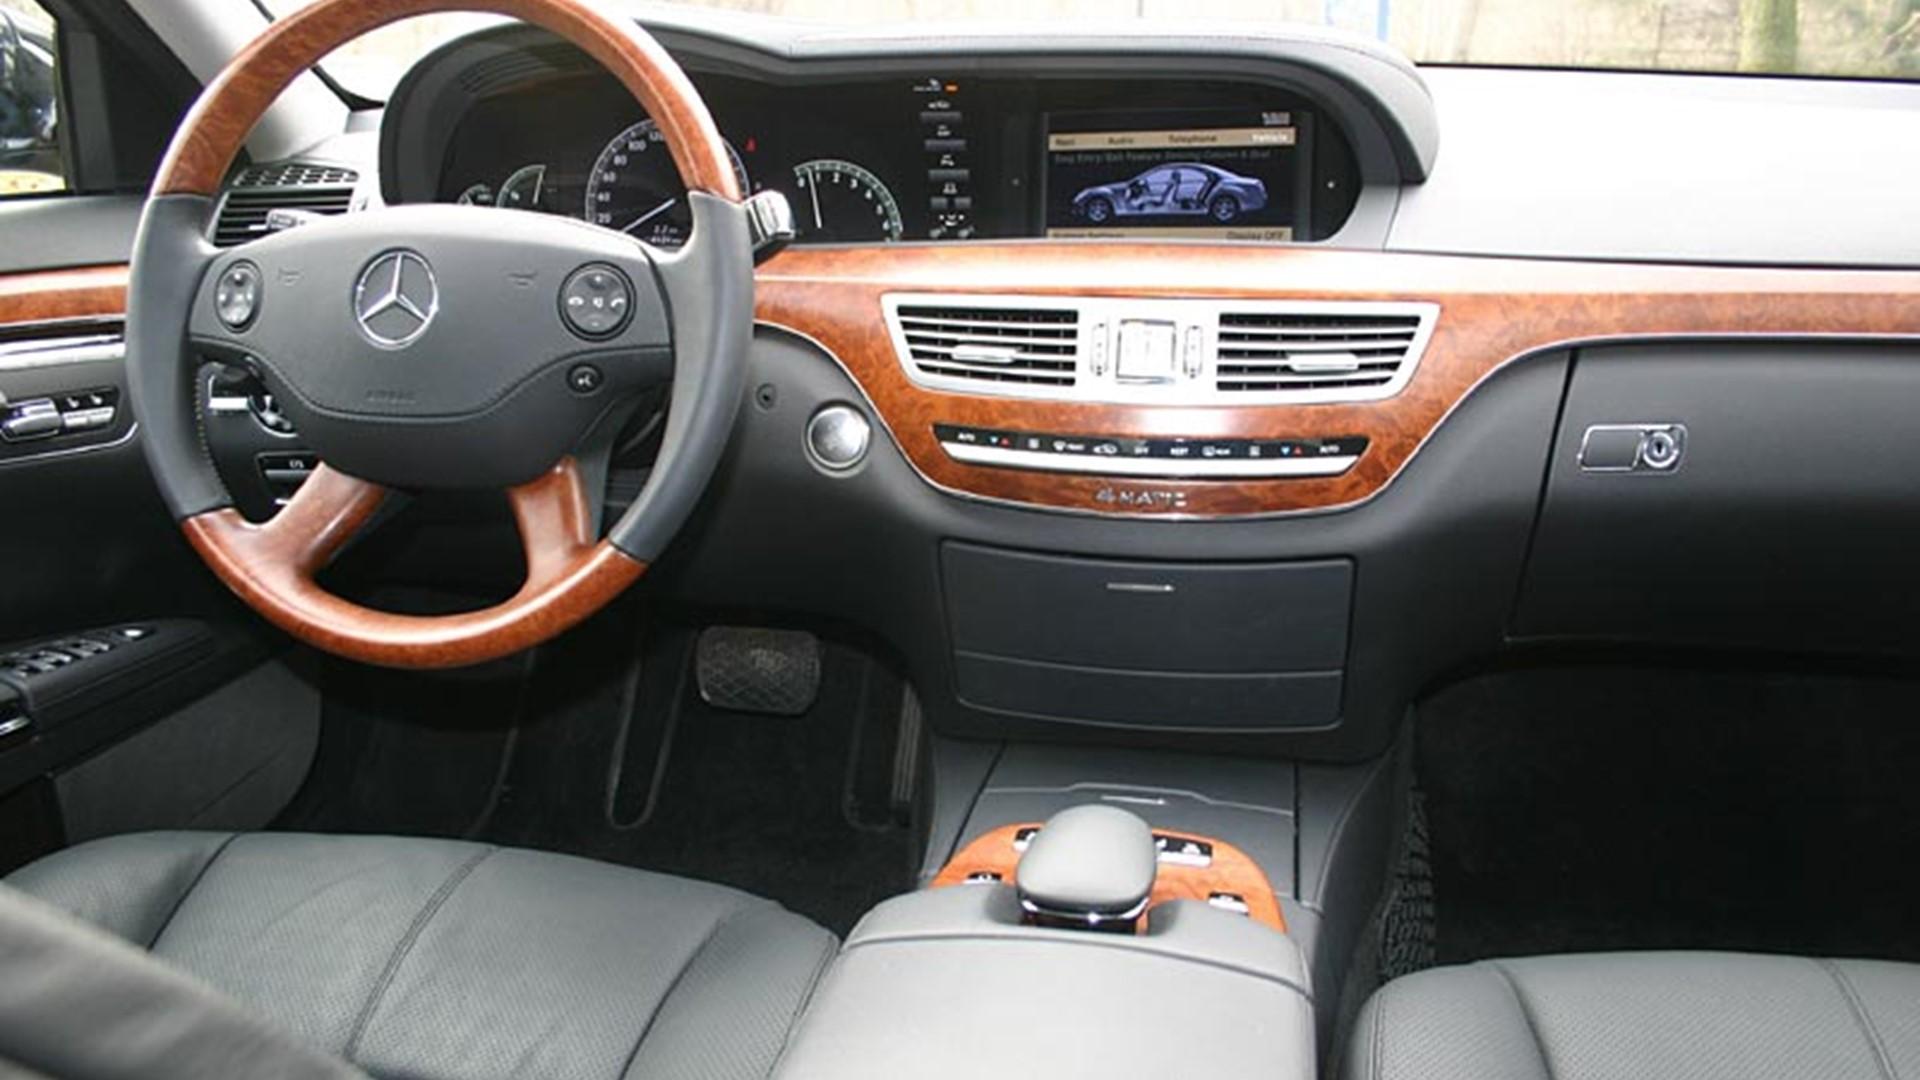 Аренда авто премиум класса с водителем Mercedes S-class Киев